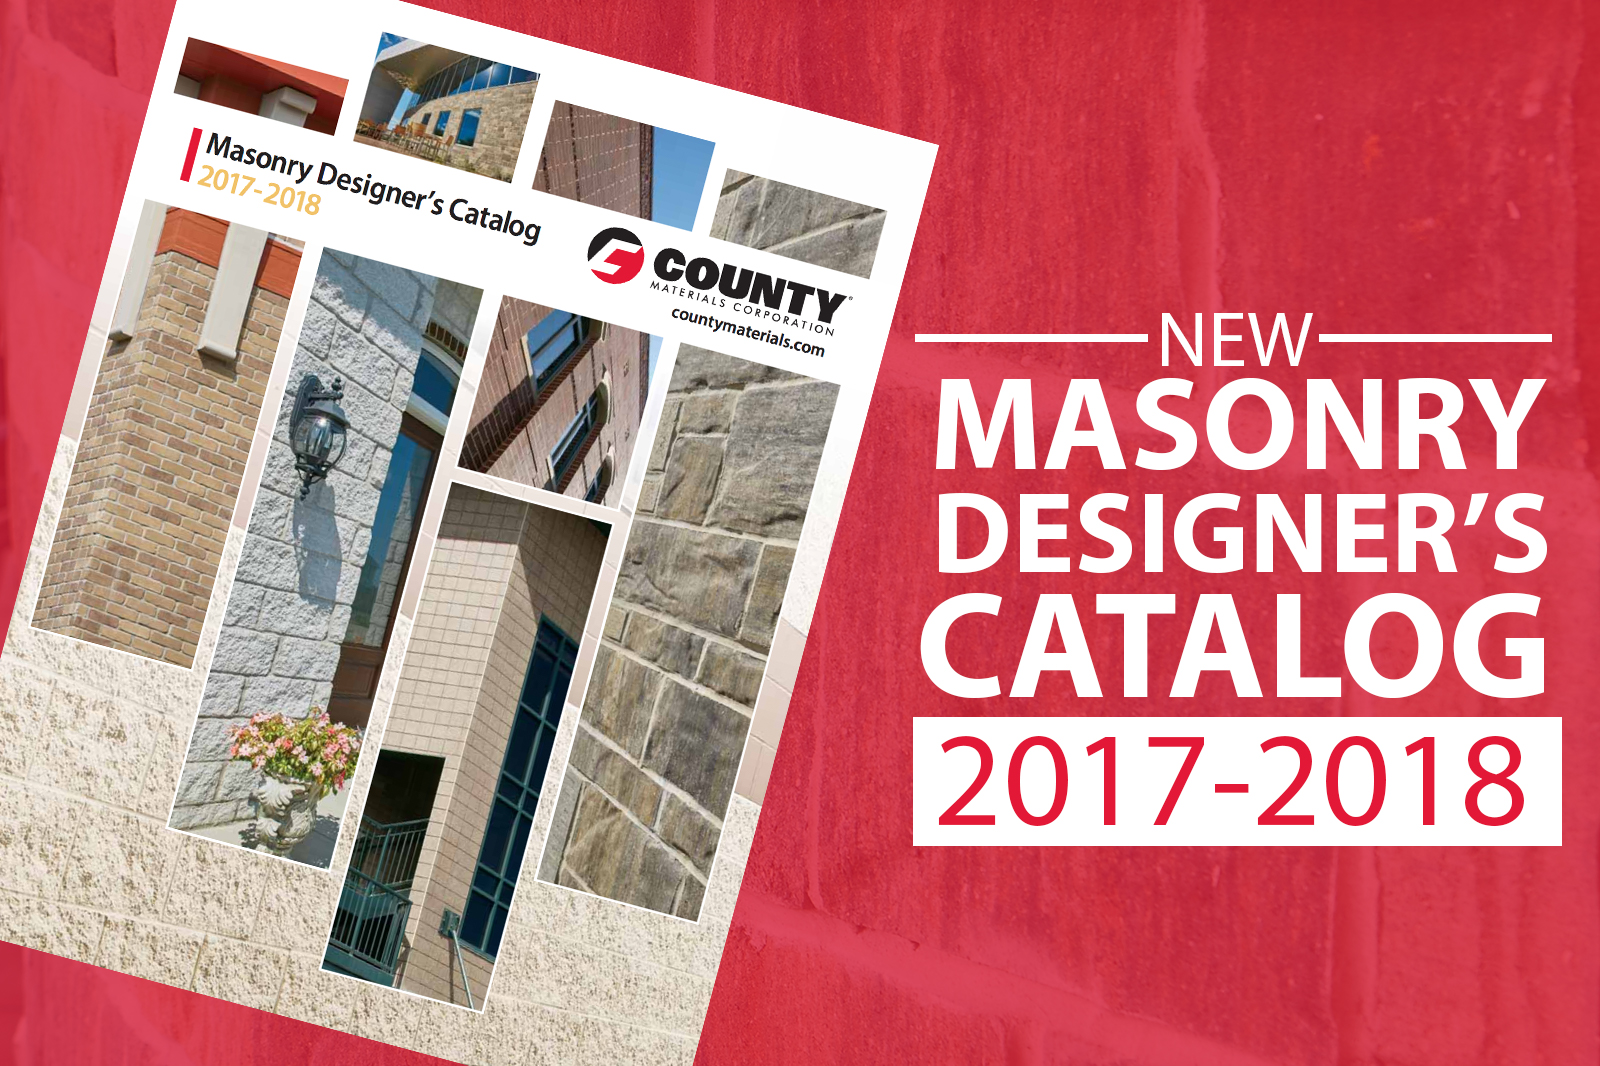 K Catalog New Masonry Designer's...